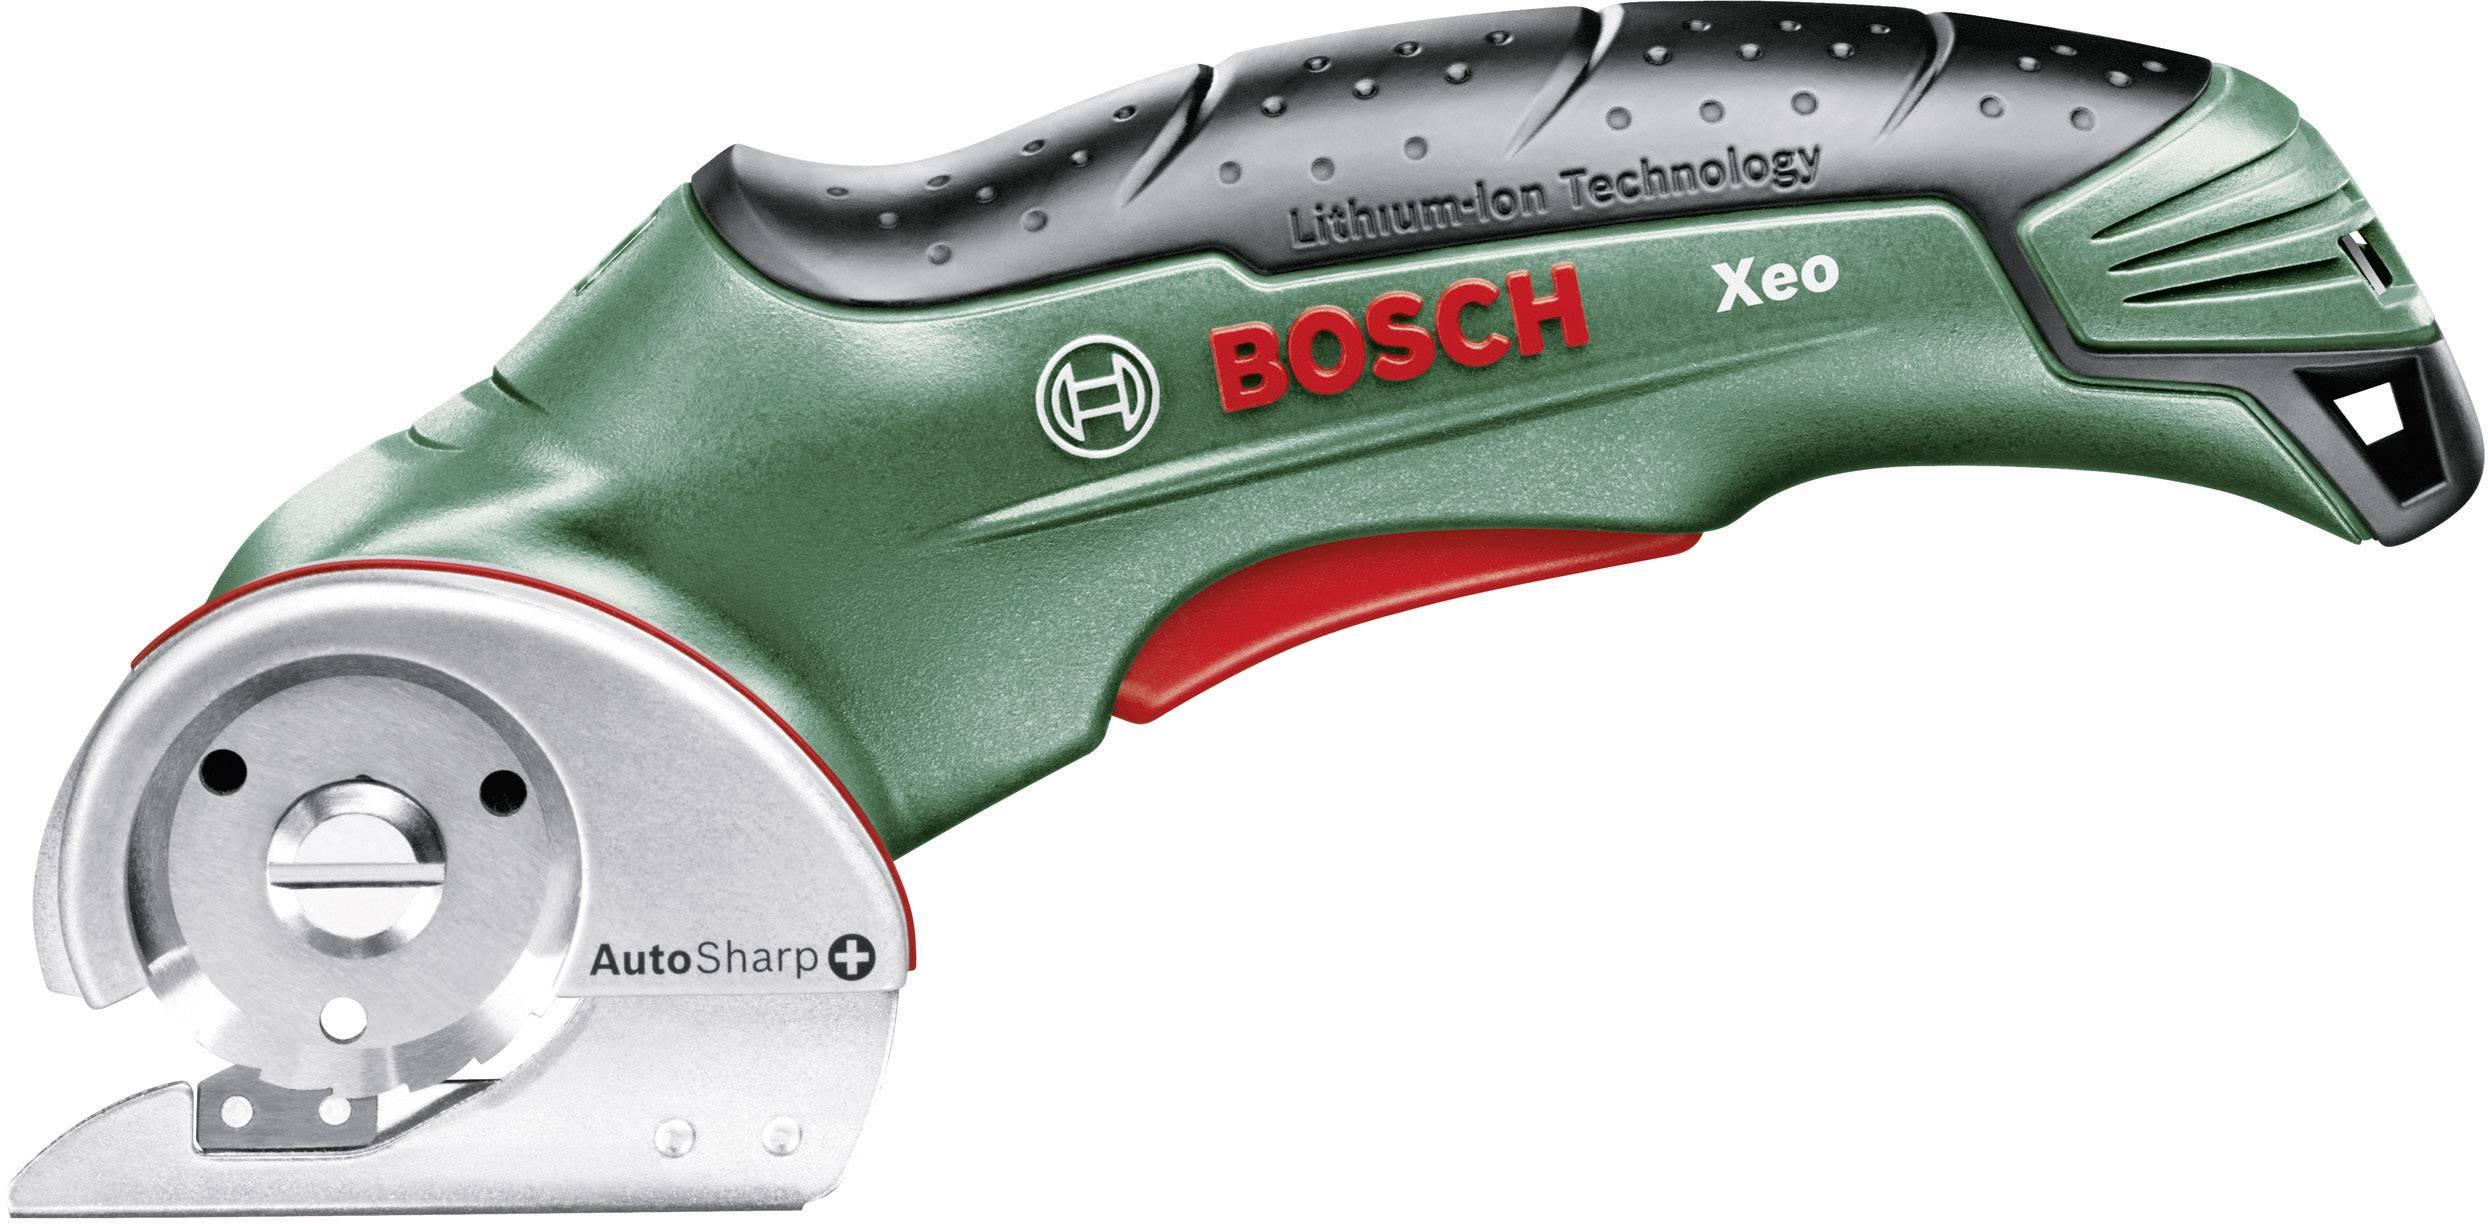 Bosch Home and Garden XEO + akumulátor, + taška, 3.6 V